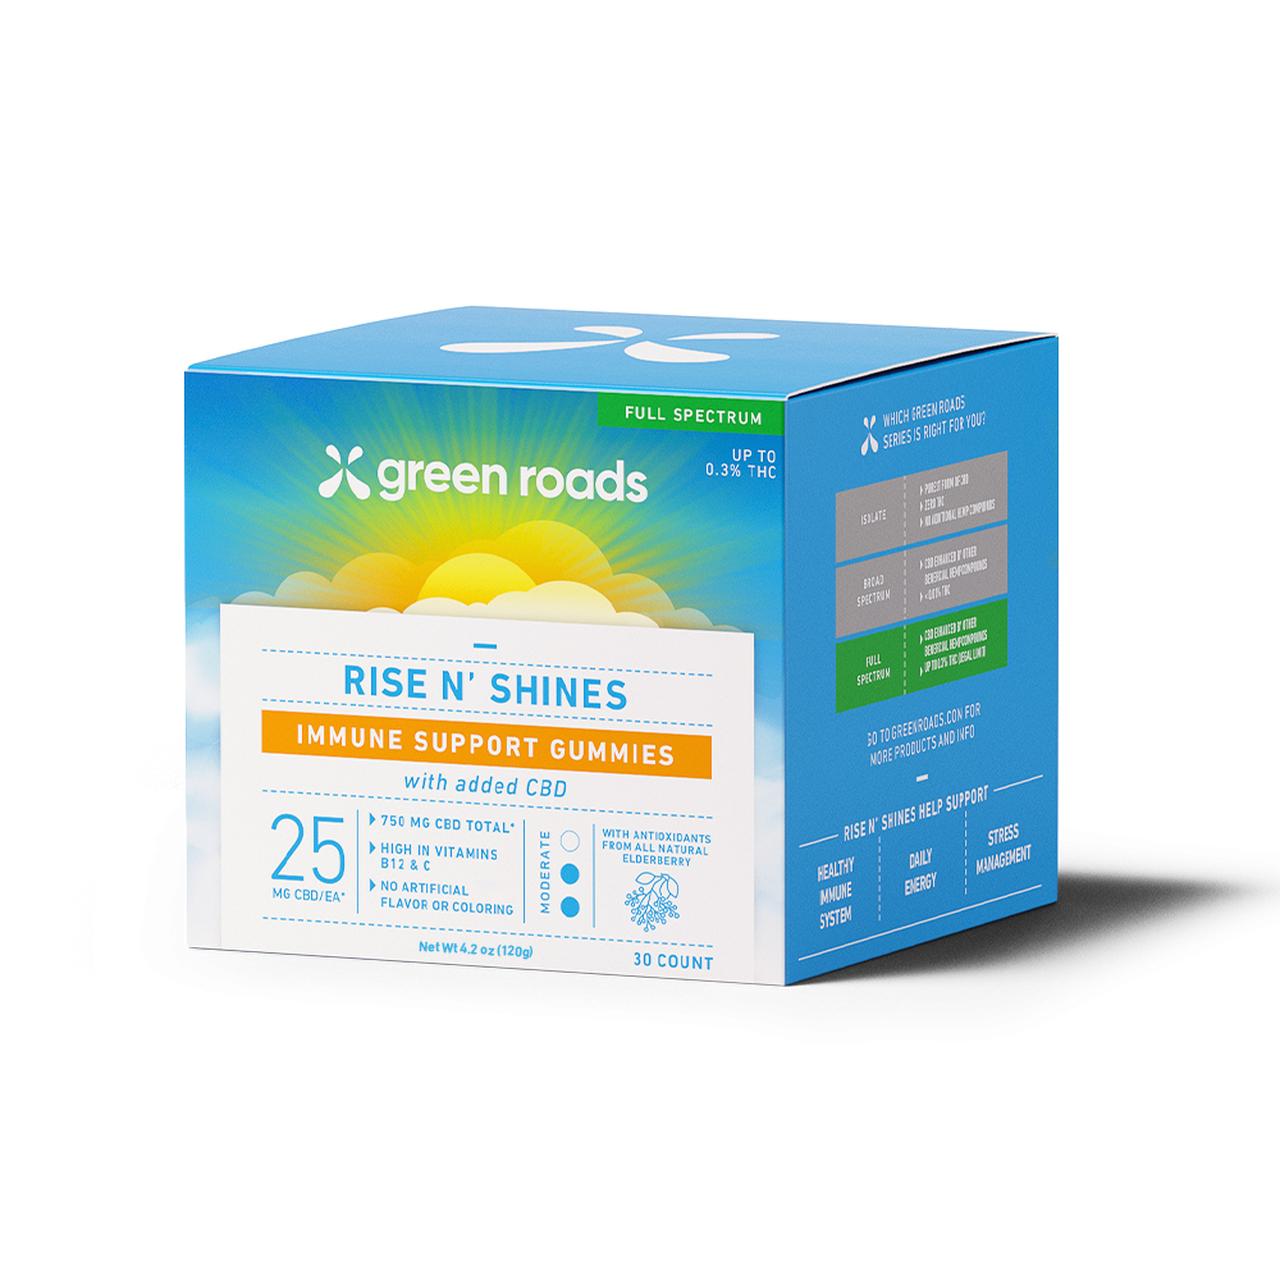 Green Roads, Rise N' Shines Immune Support CBD Gummies, Full Spectrum, 30ct, 750mg CBD 1